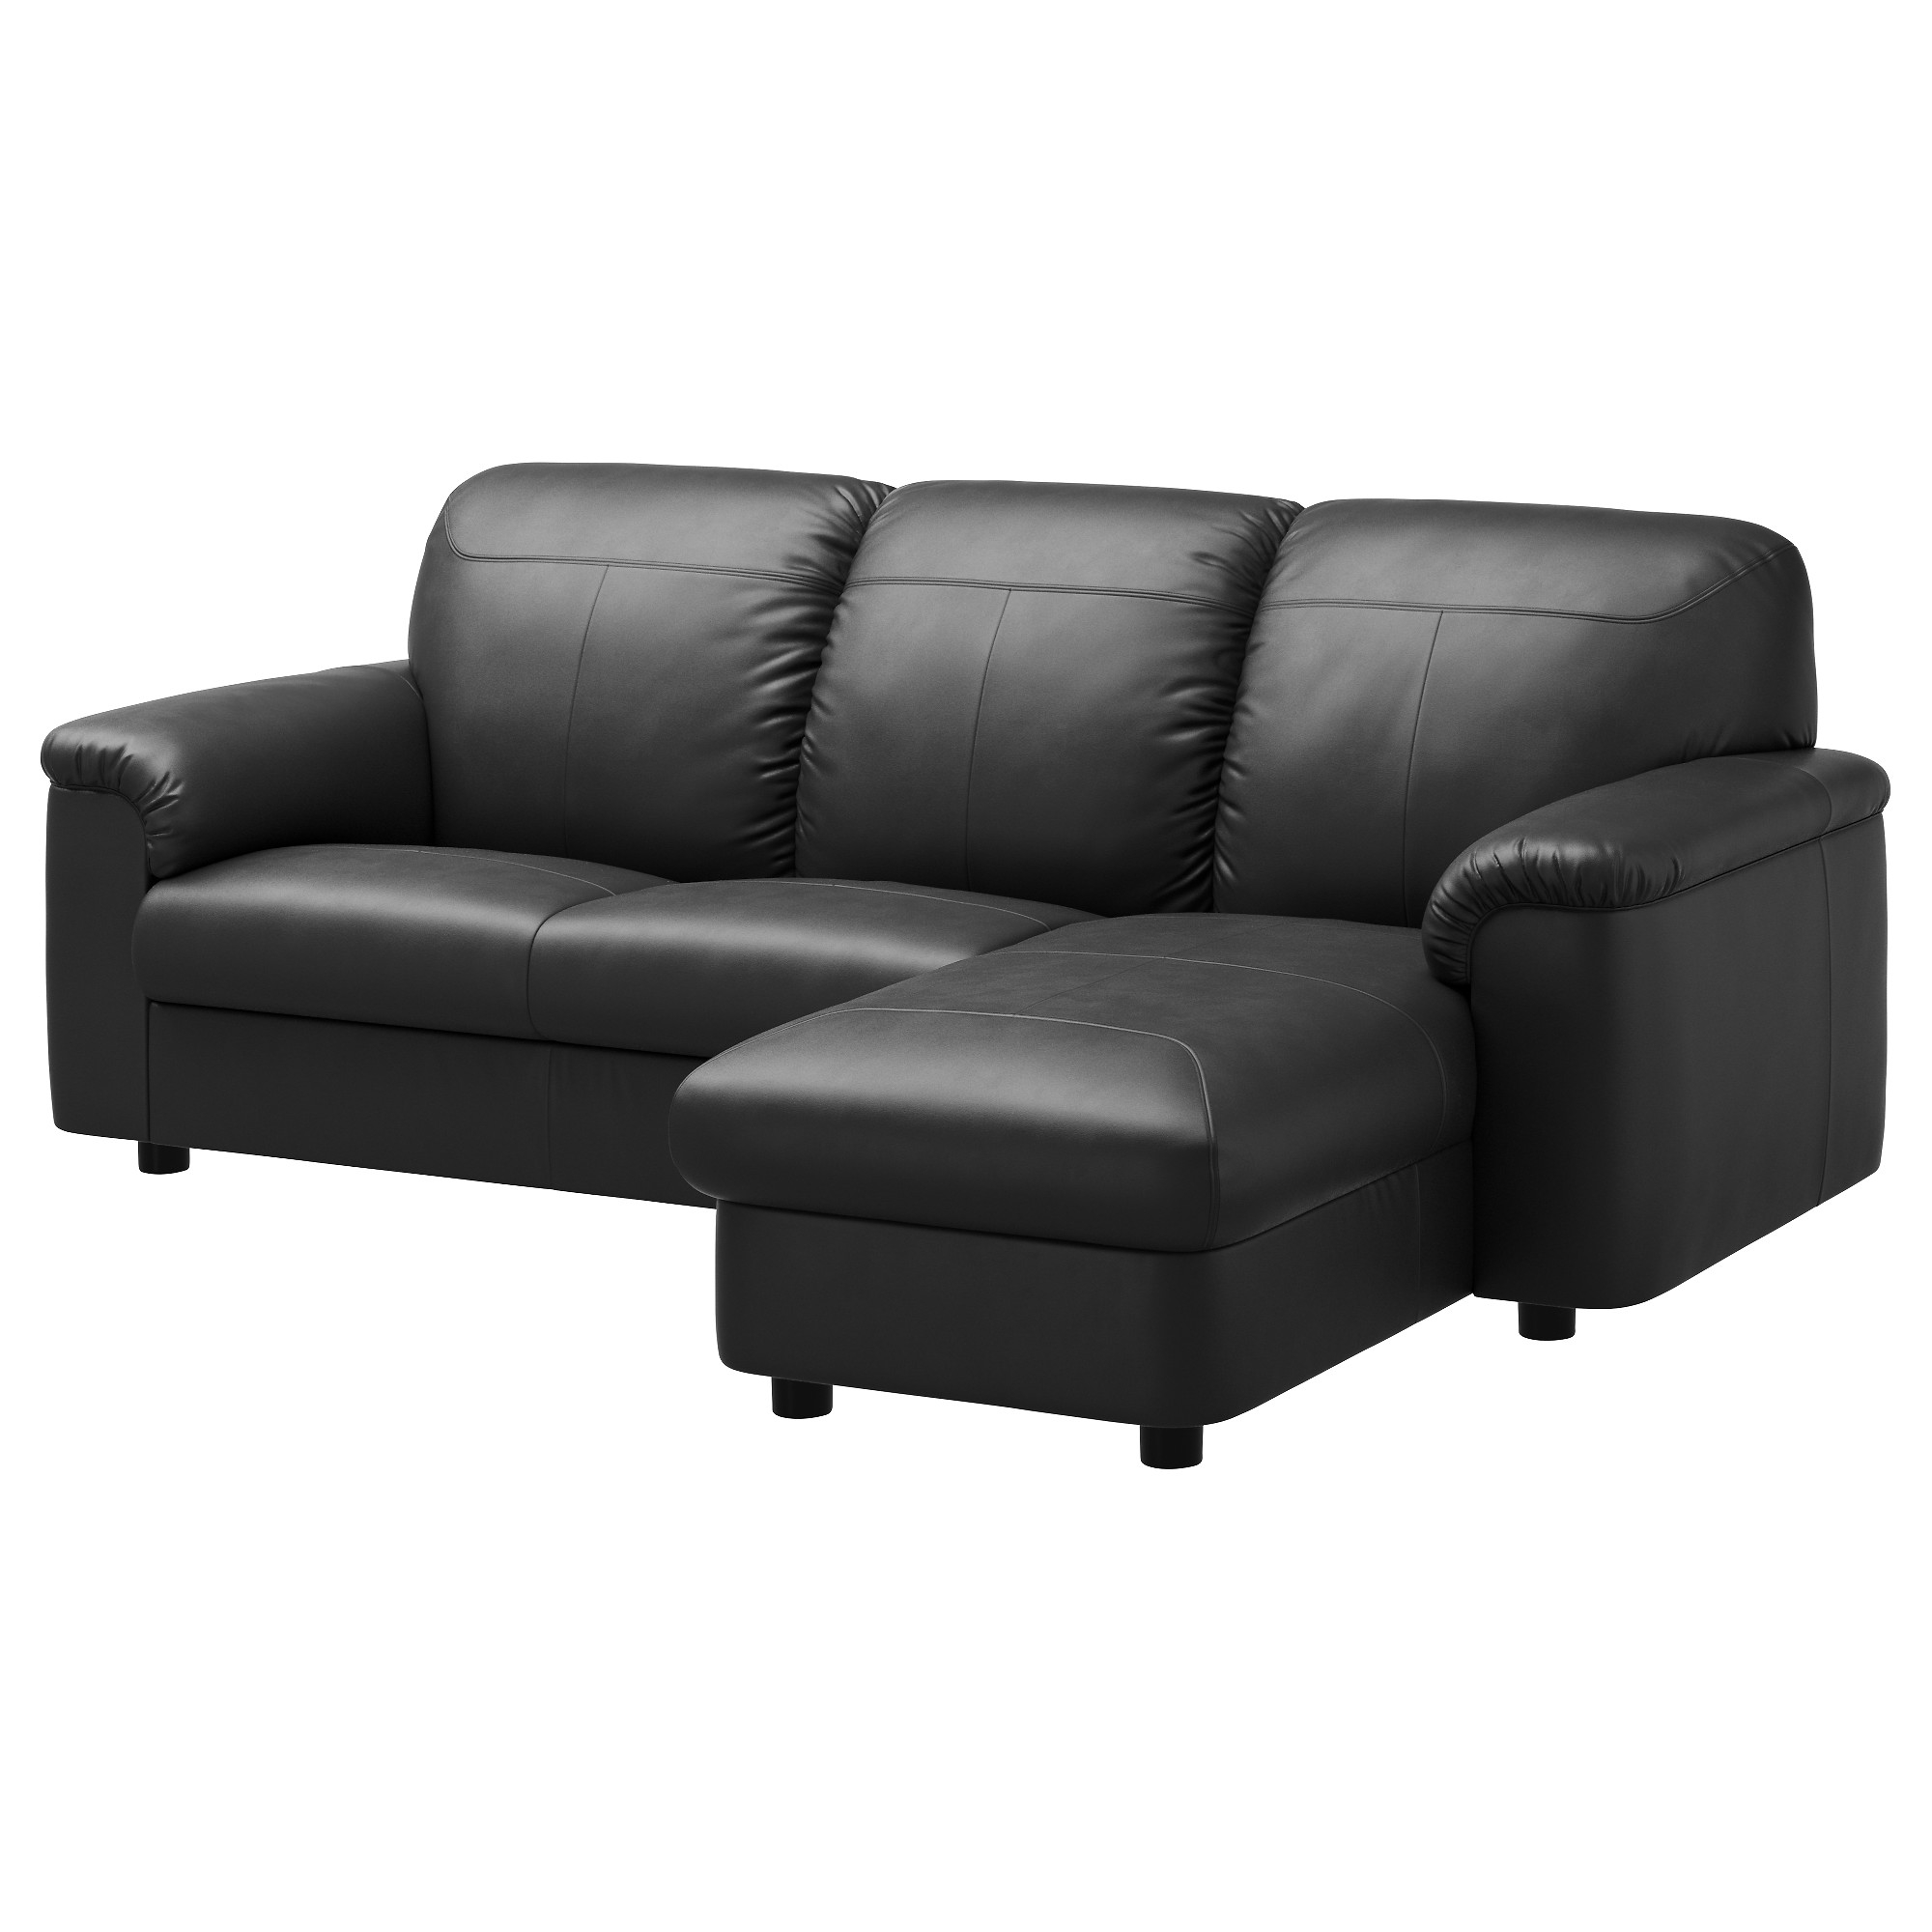 Timsfors sof 2 plazas chaise longue for Sofa 2 plazas mas chaise longue